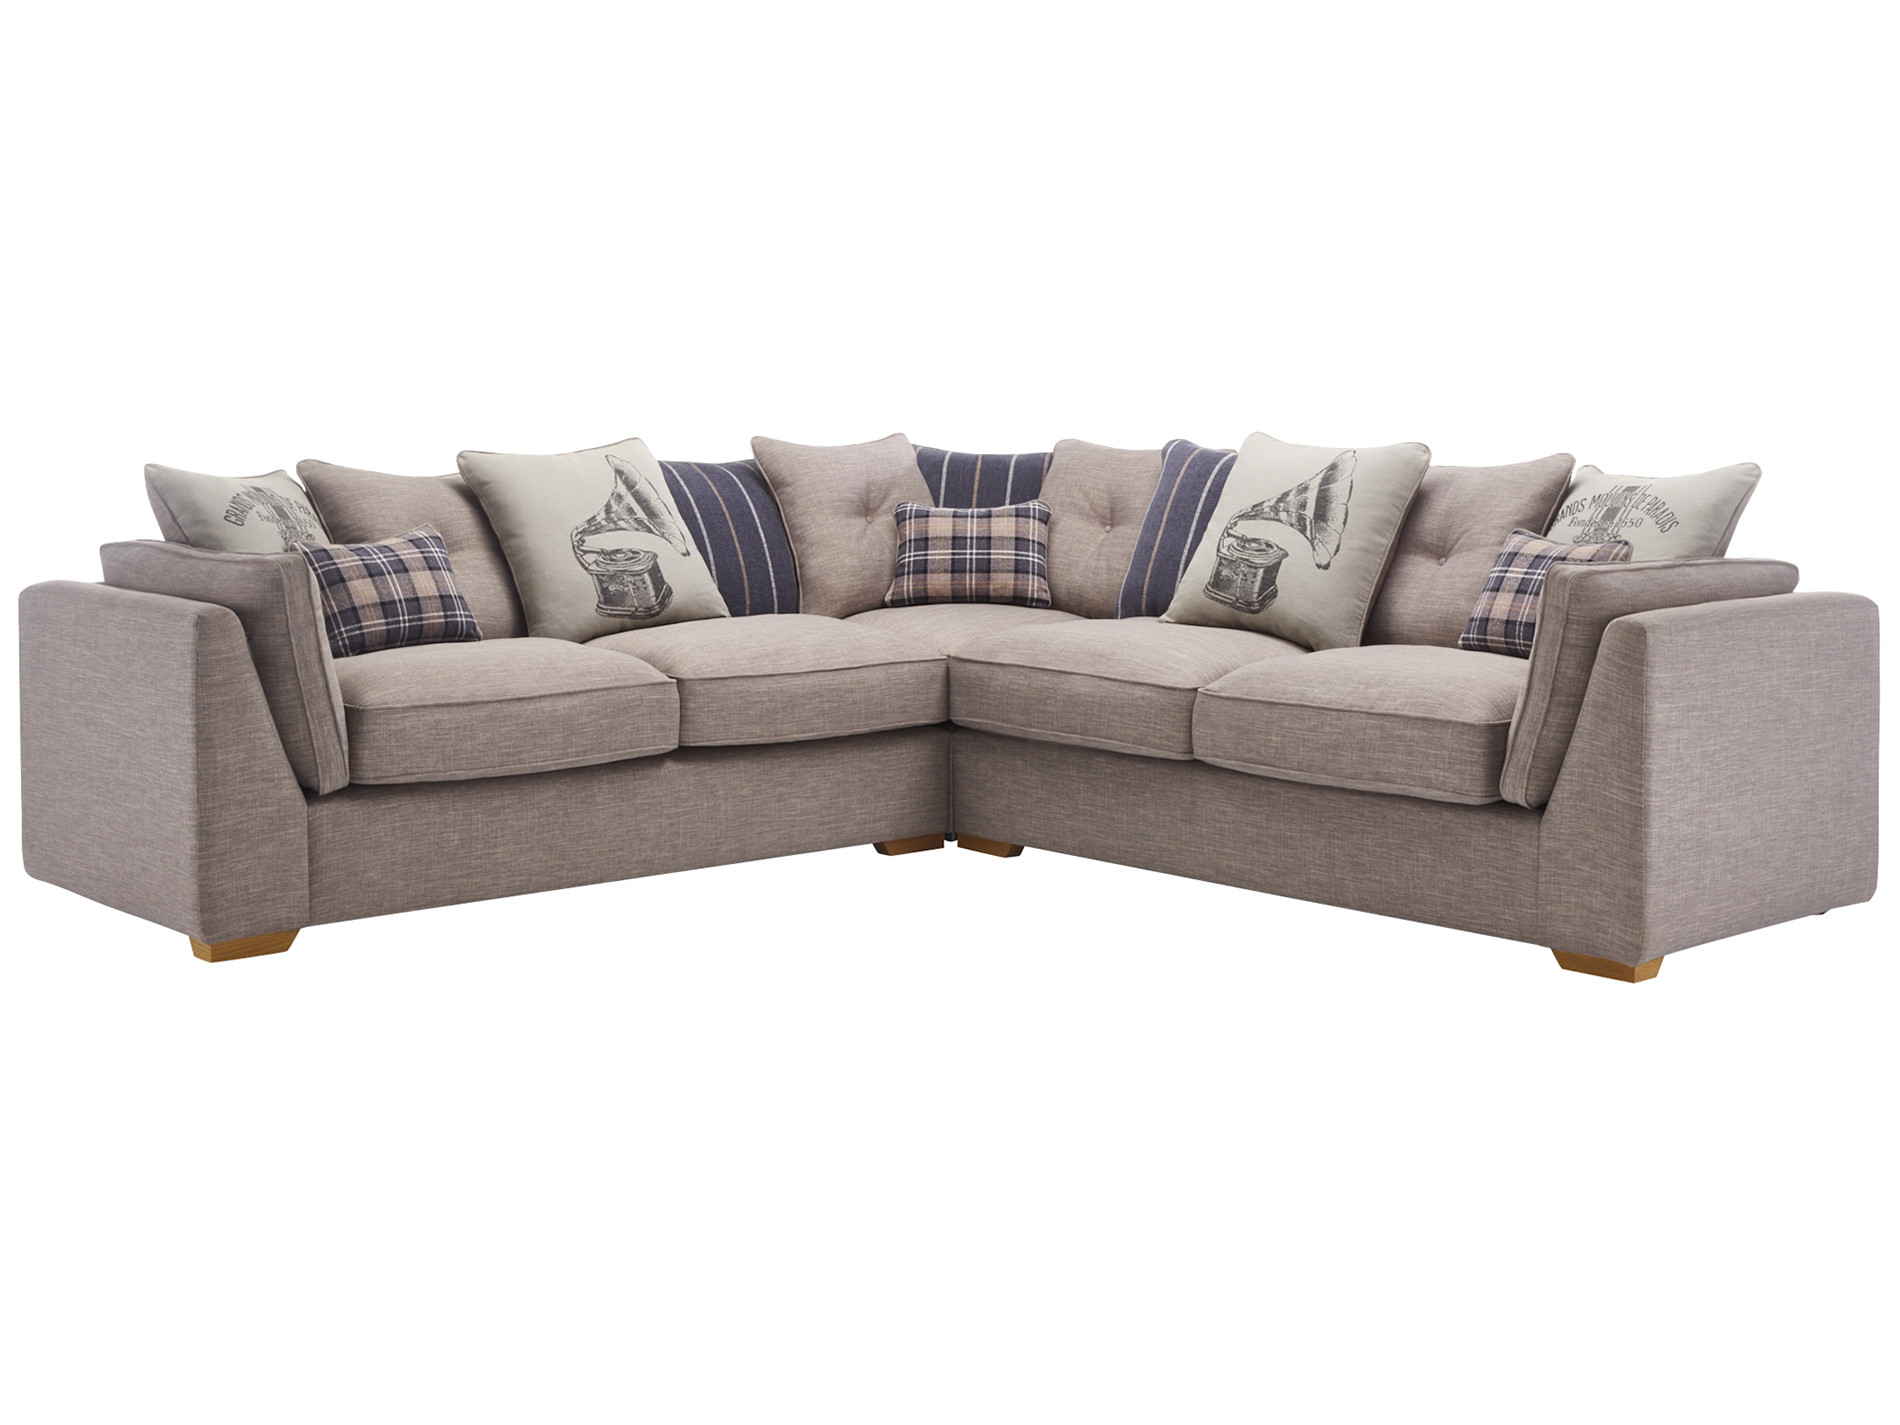 california 4 seater pillow back corner sofa civic smoke. Black Bedroom Furniture Sets. Home Design Ideas